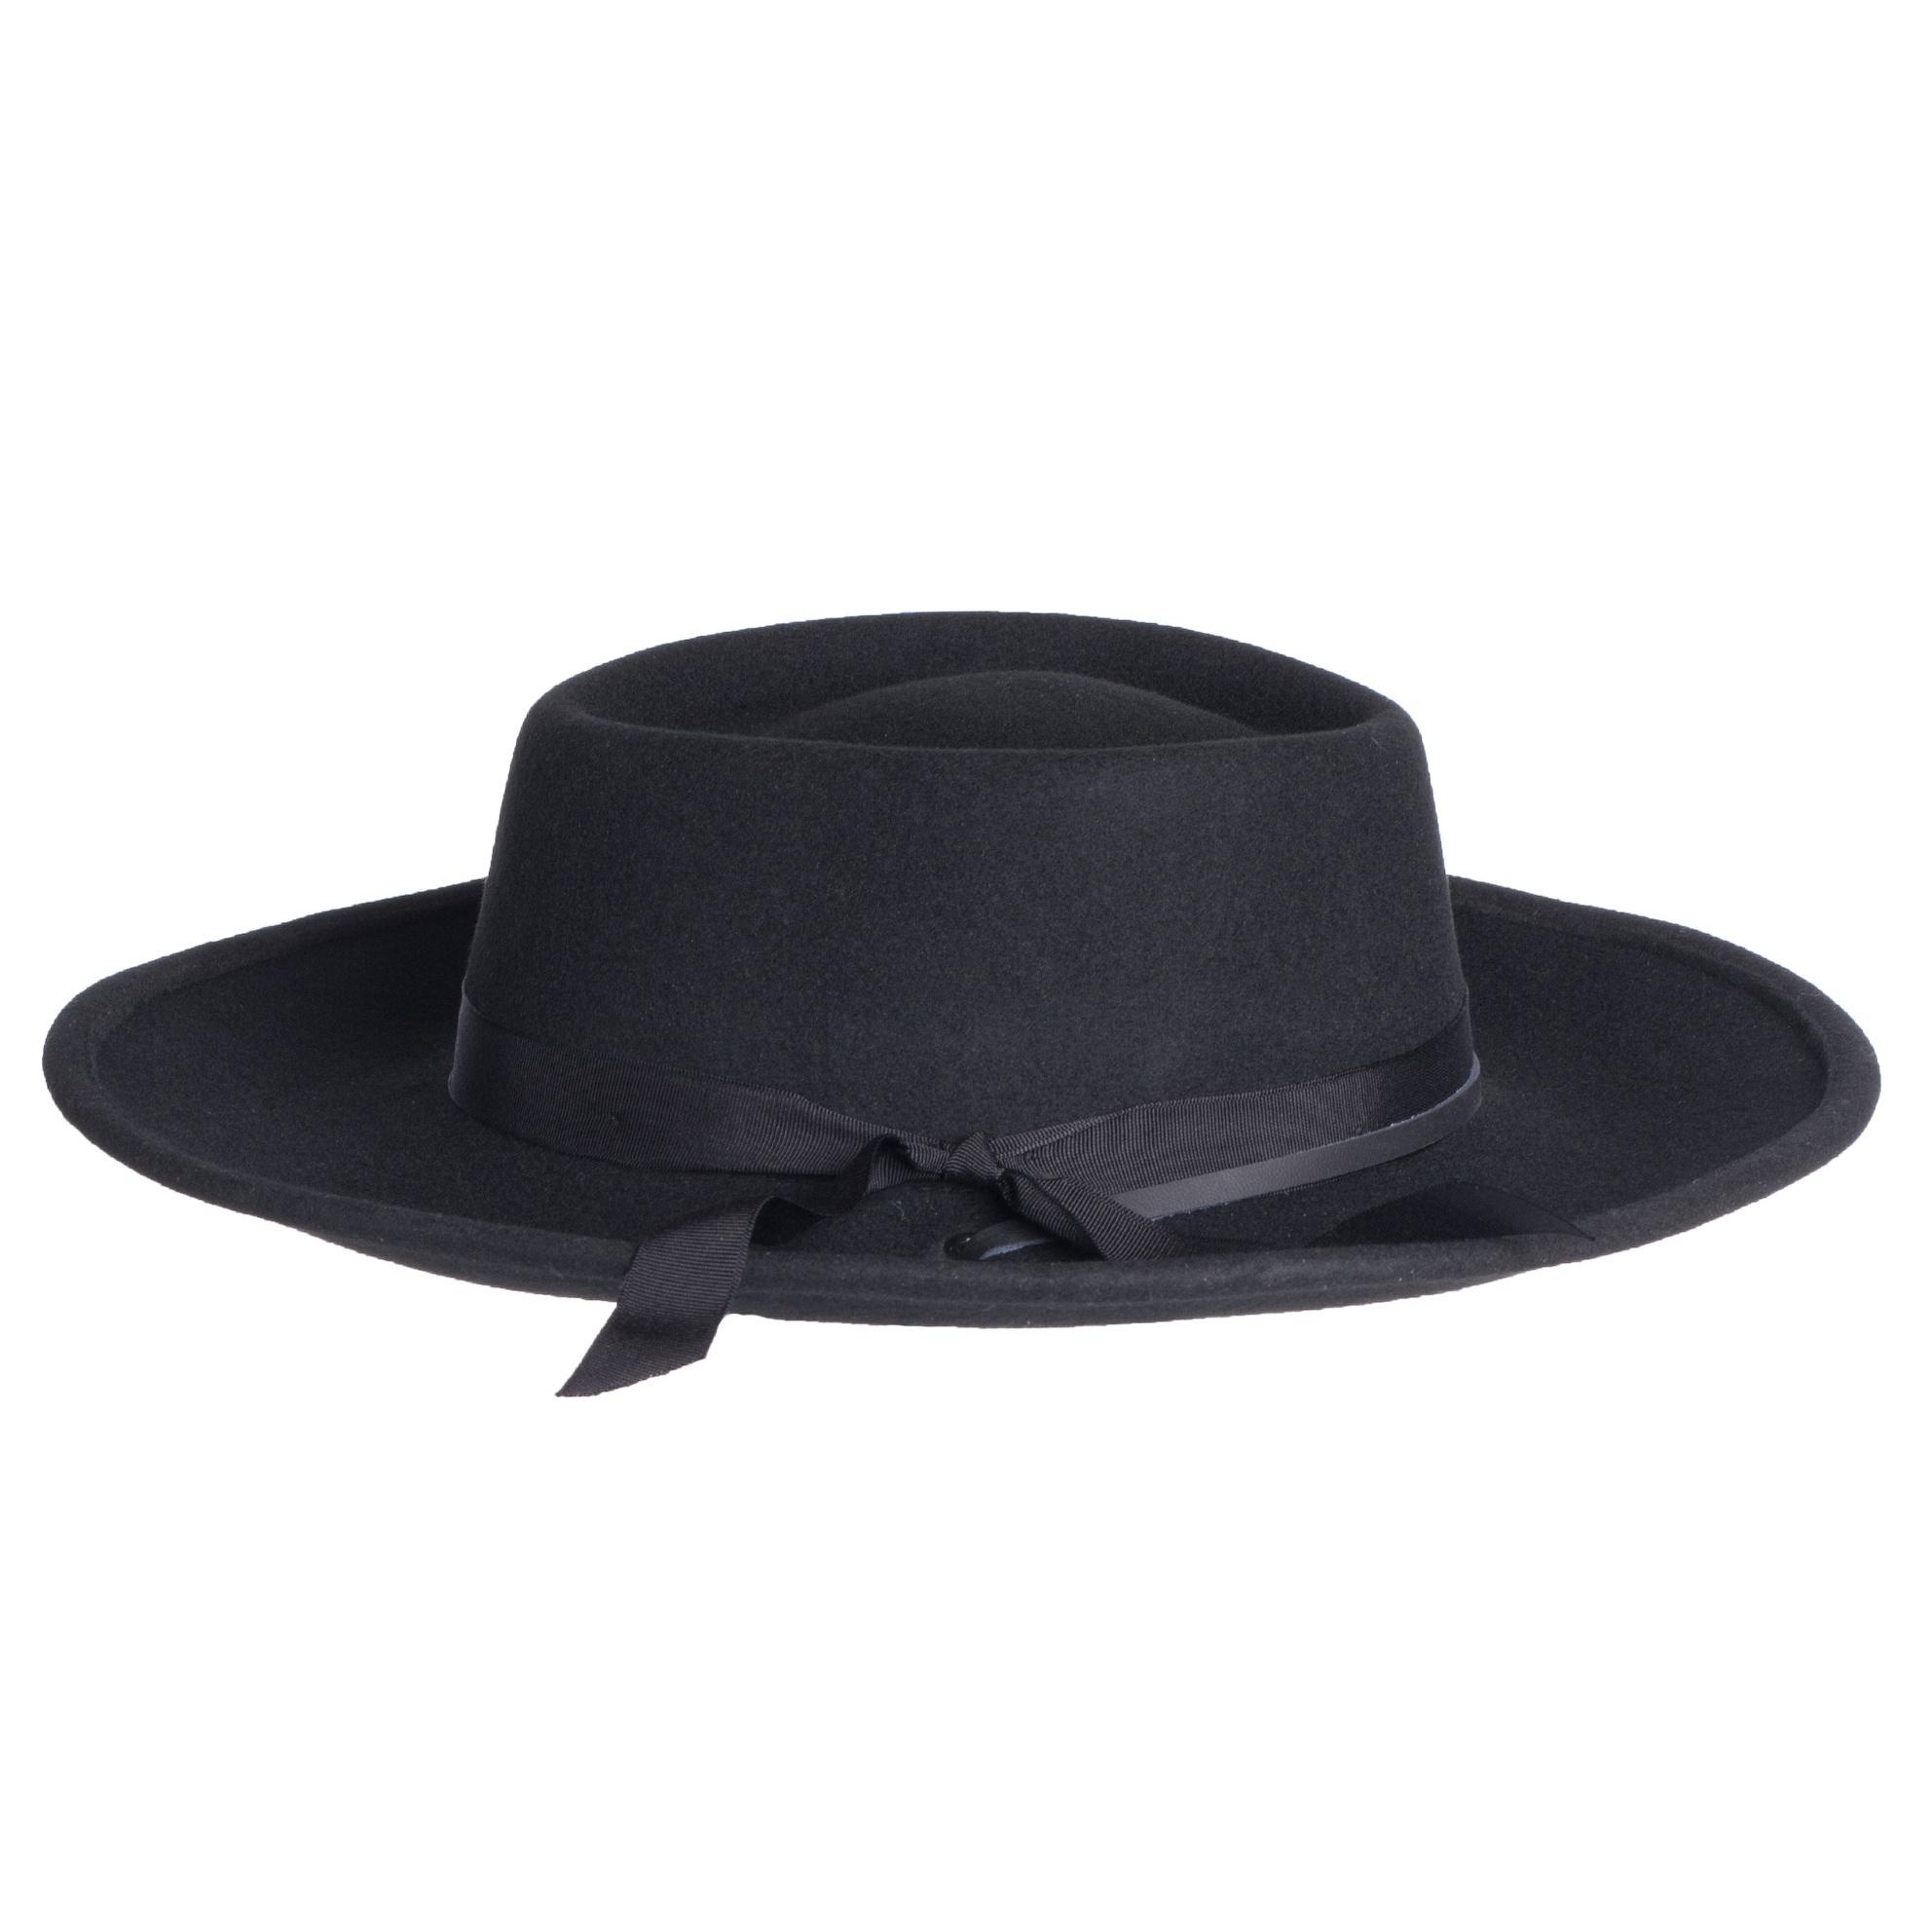 Shop Mens Wyatt Earp Style Wide Brim Wool Fedora Hats - Free ... 7e5242b5a8b